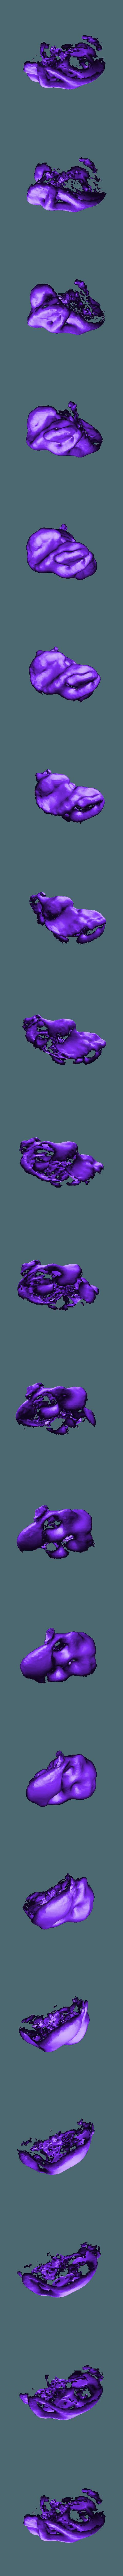 Africanus.stl Download free STL file Australopithicus Africanus (Taung Child Skull Fragment) • Object to 3D print, sjpiper145